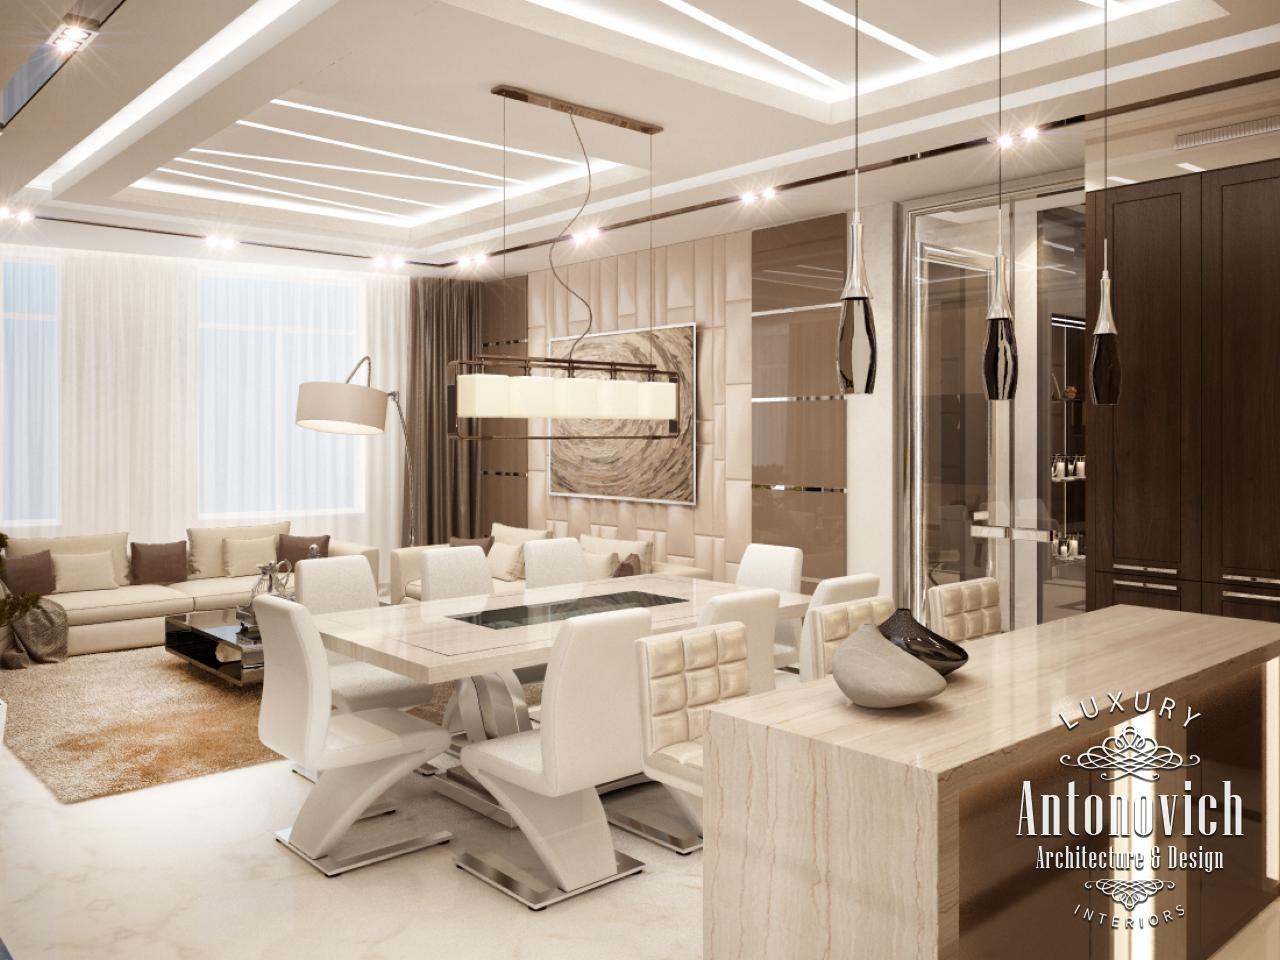 Kitchens dubai from antonovich design - Interior Design Dubai From Luxury Antonovich Design